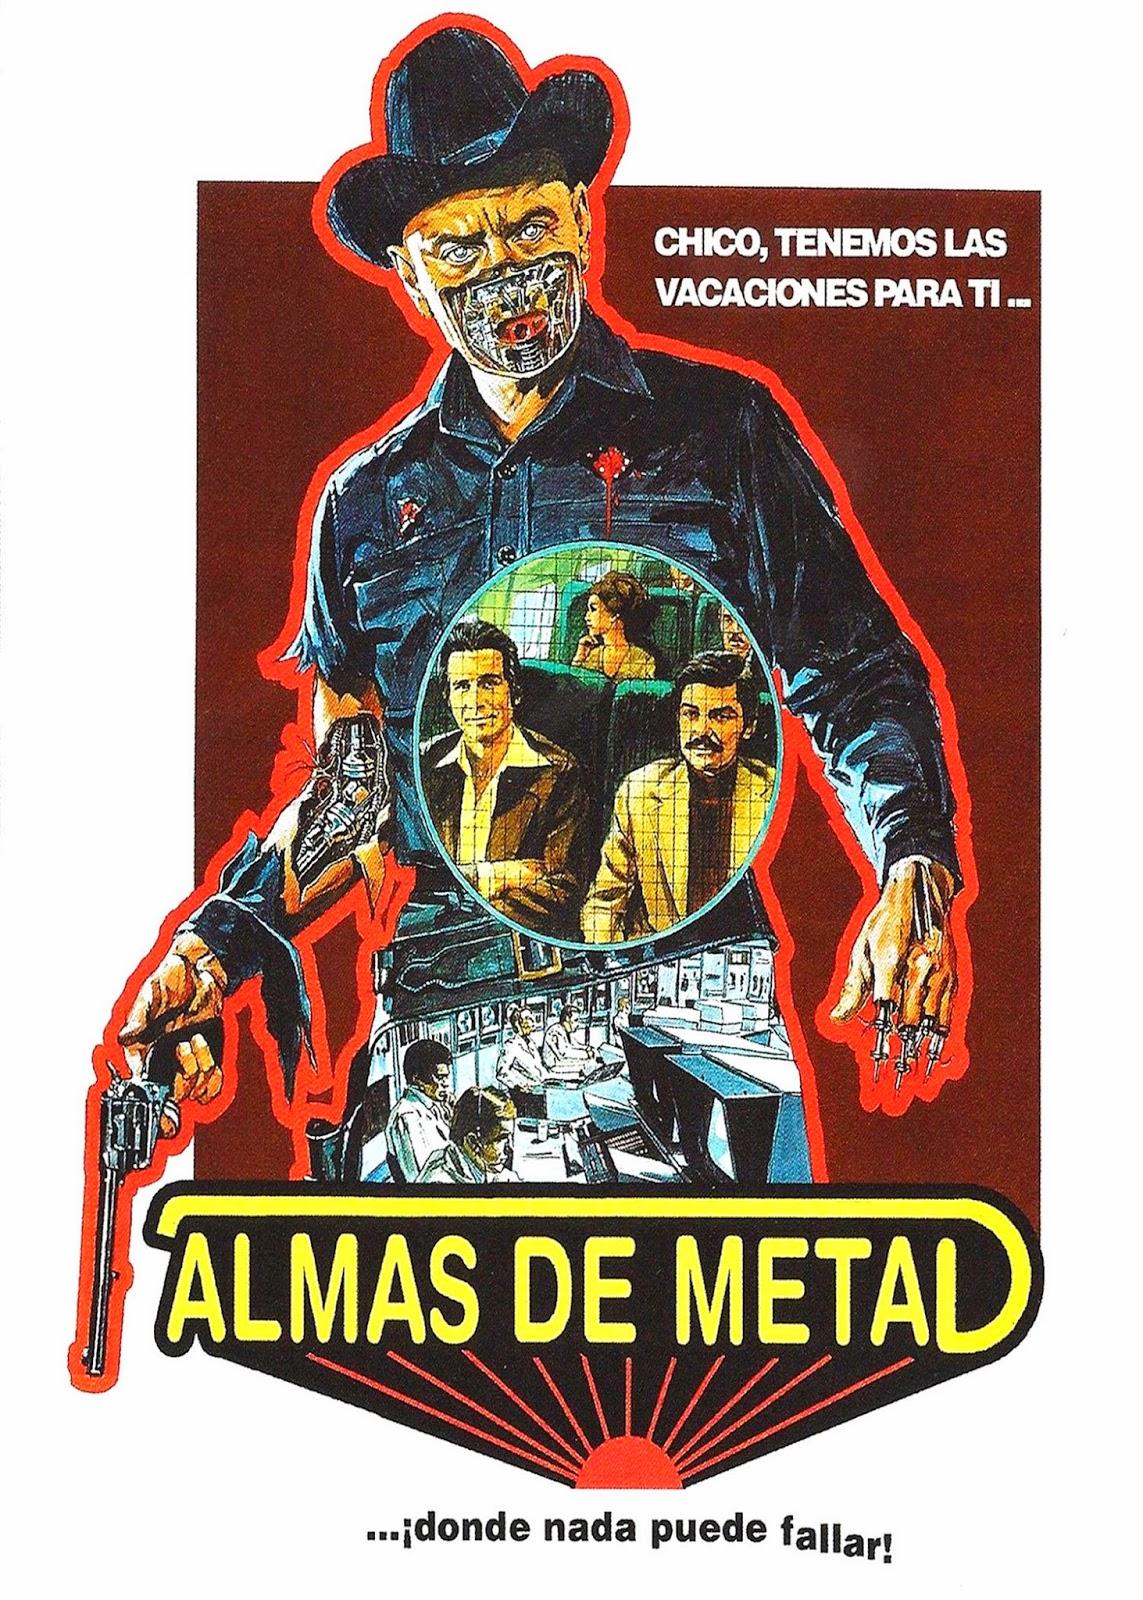 Almas de metal (1973)